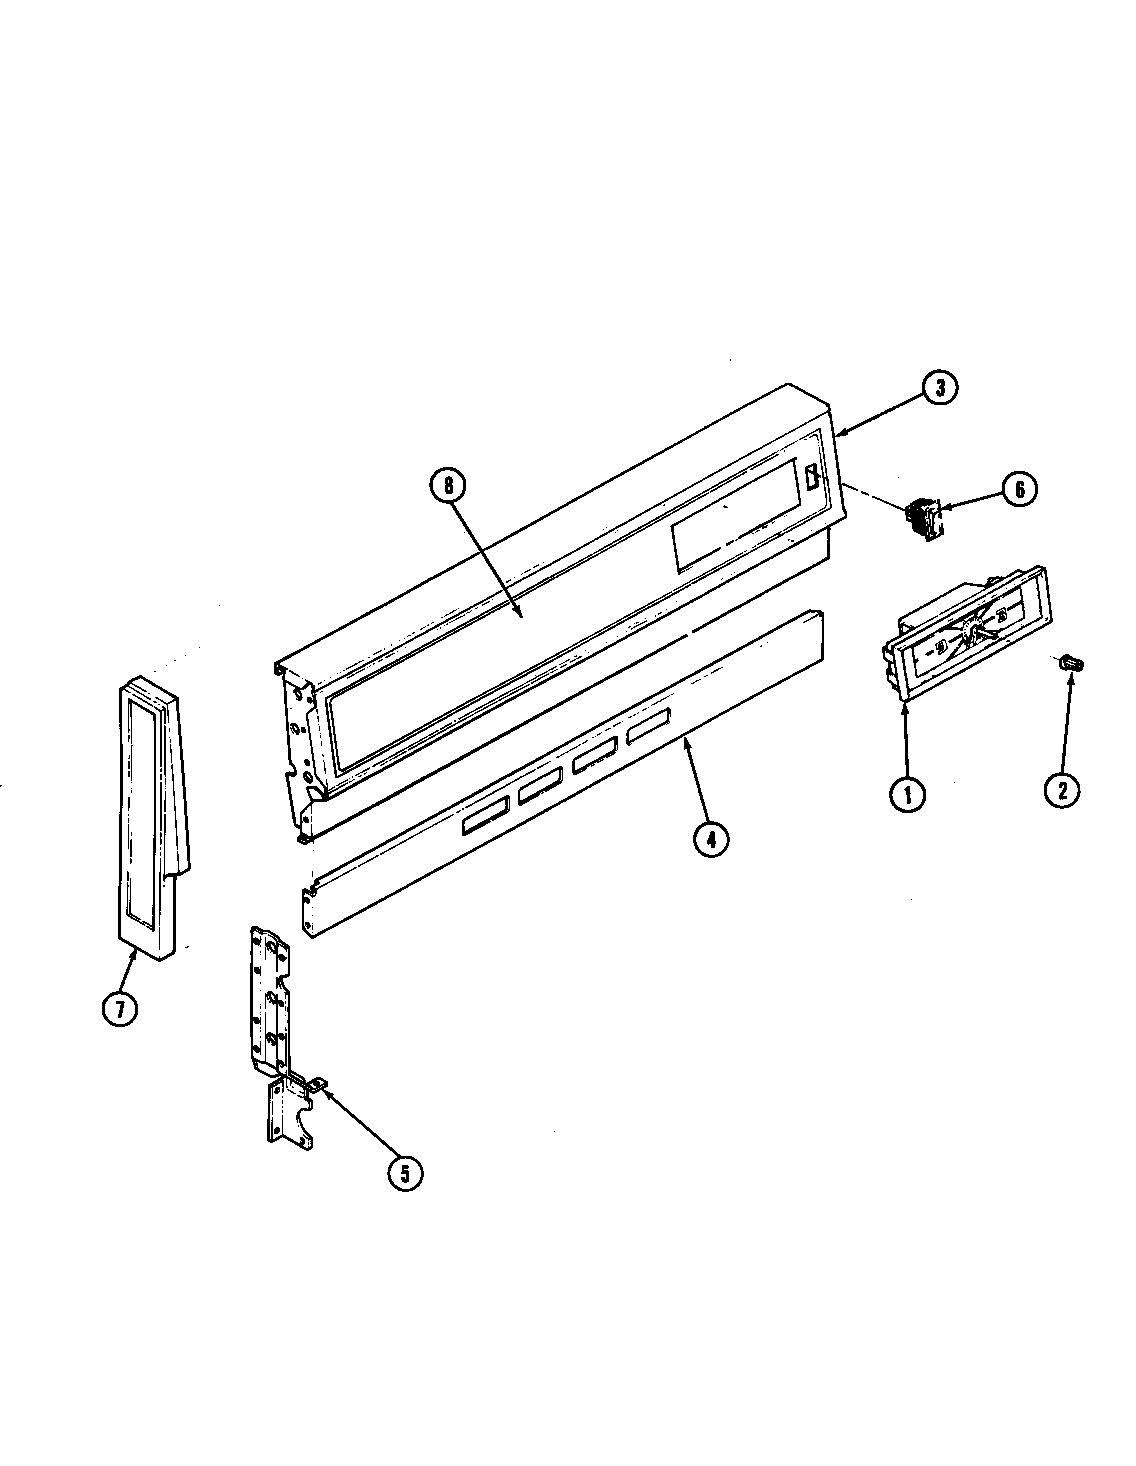 Magic-Chef model 31HA-92KXS-ON range (gas) genuine parts